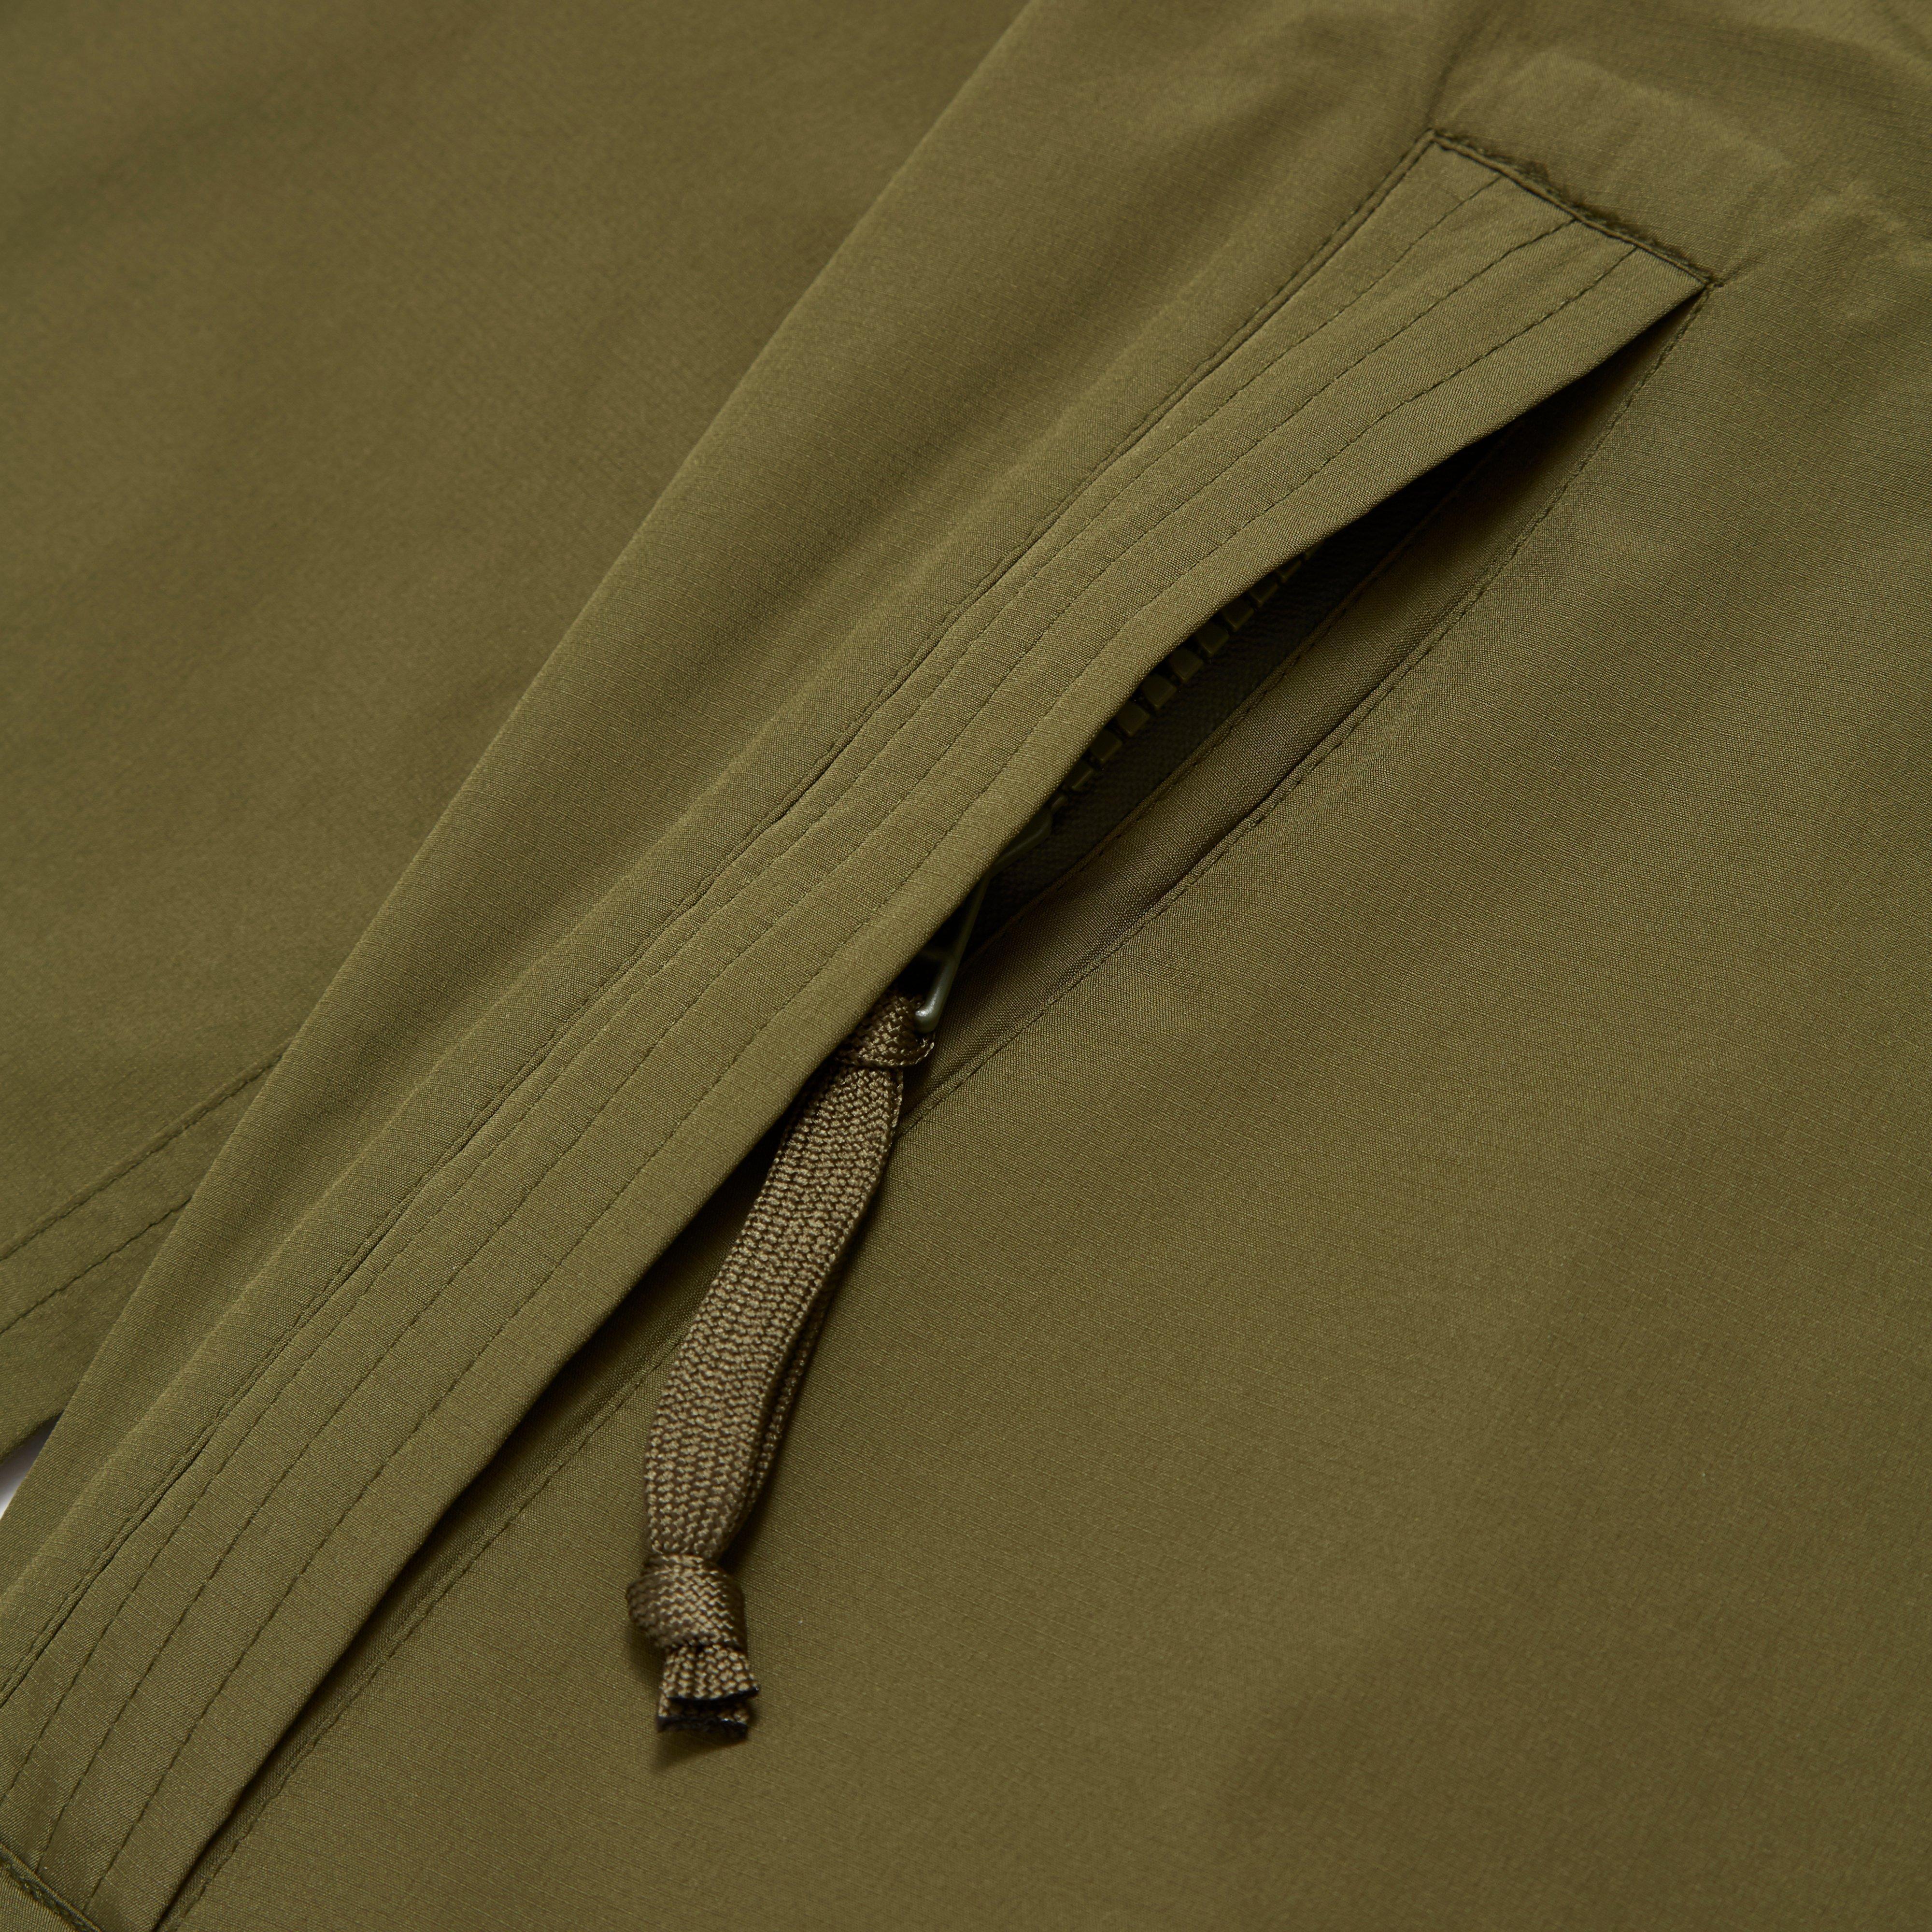 Lyst snow peak wind water resistant jacket in green for Wind resistant material